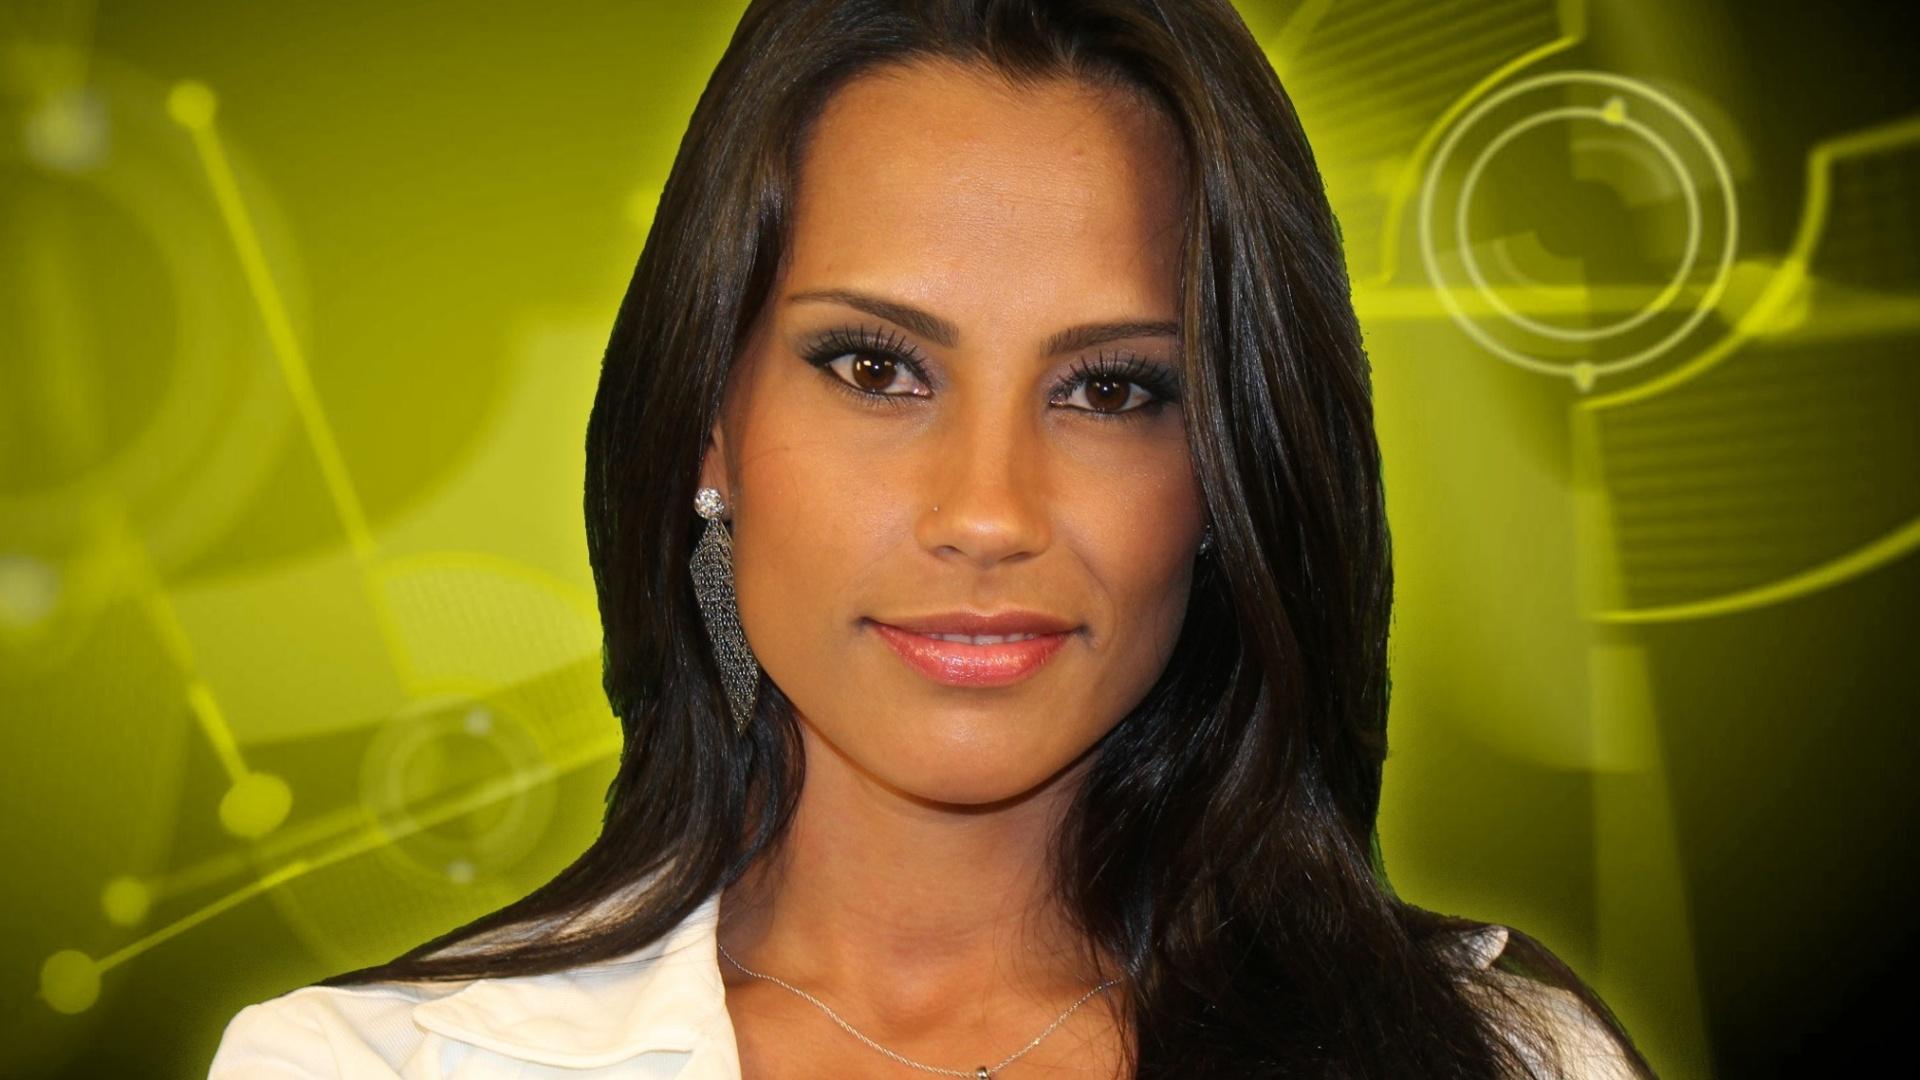 Kelly, 28 anos, assistente comercial, de Minas Gerais, participante do BBB 12 (jan/2012)